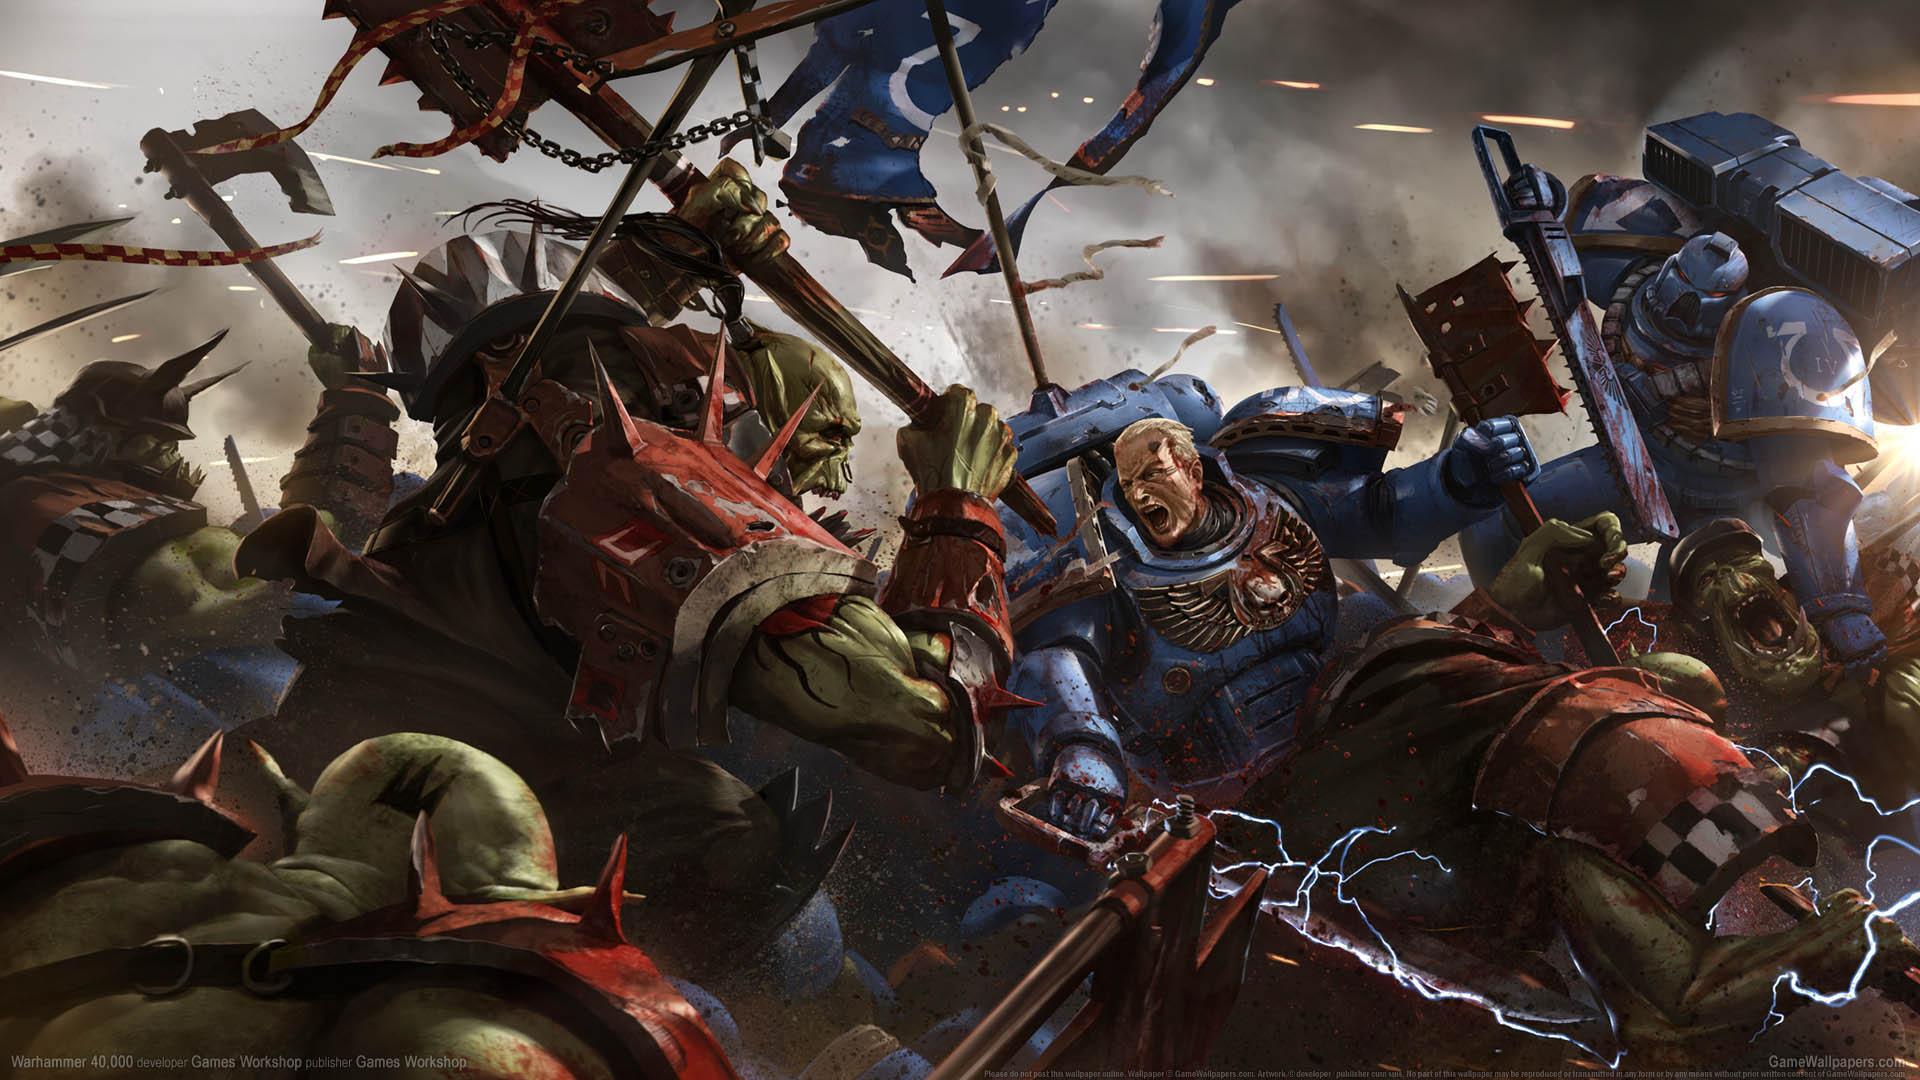 Warhammer 40000 Fondo De Escritorio 01 1920x1080